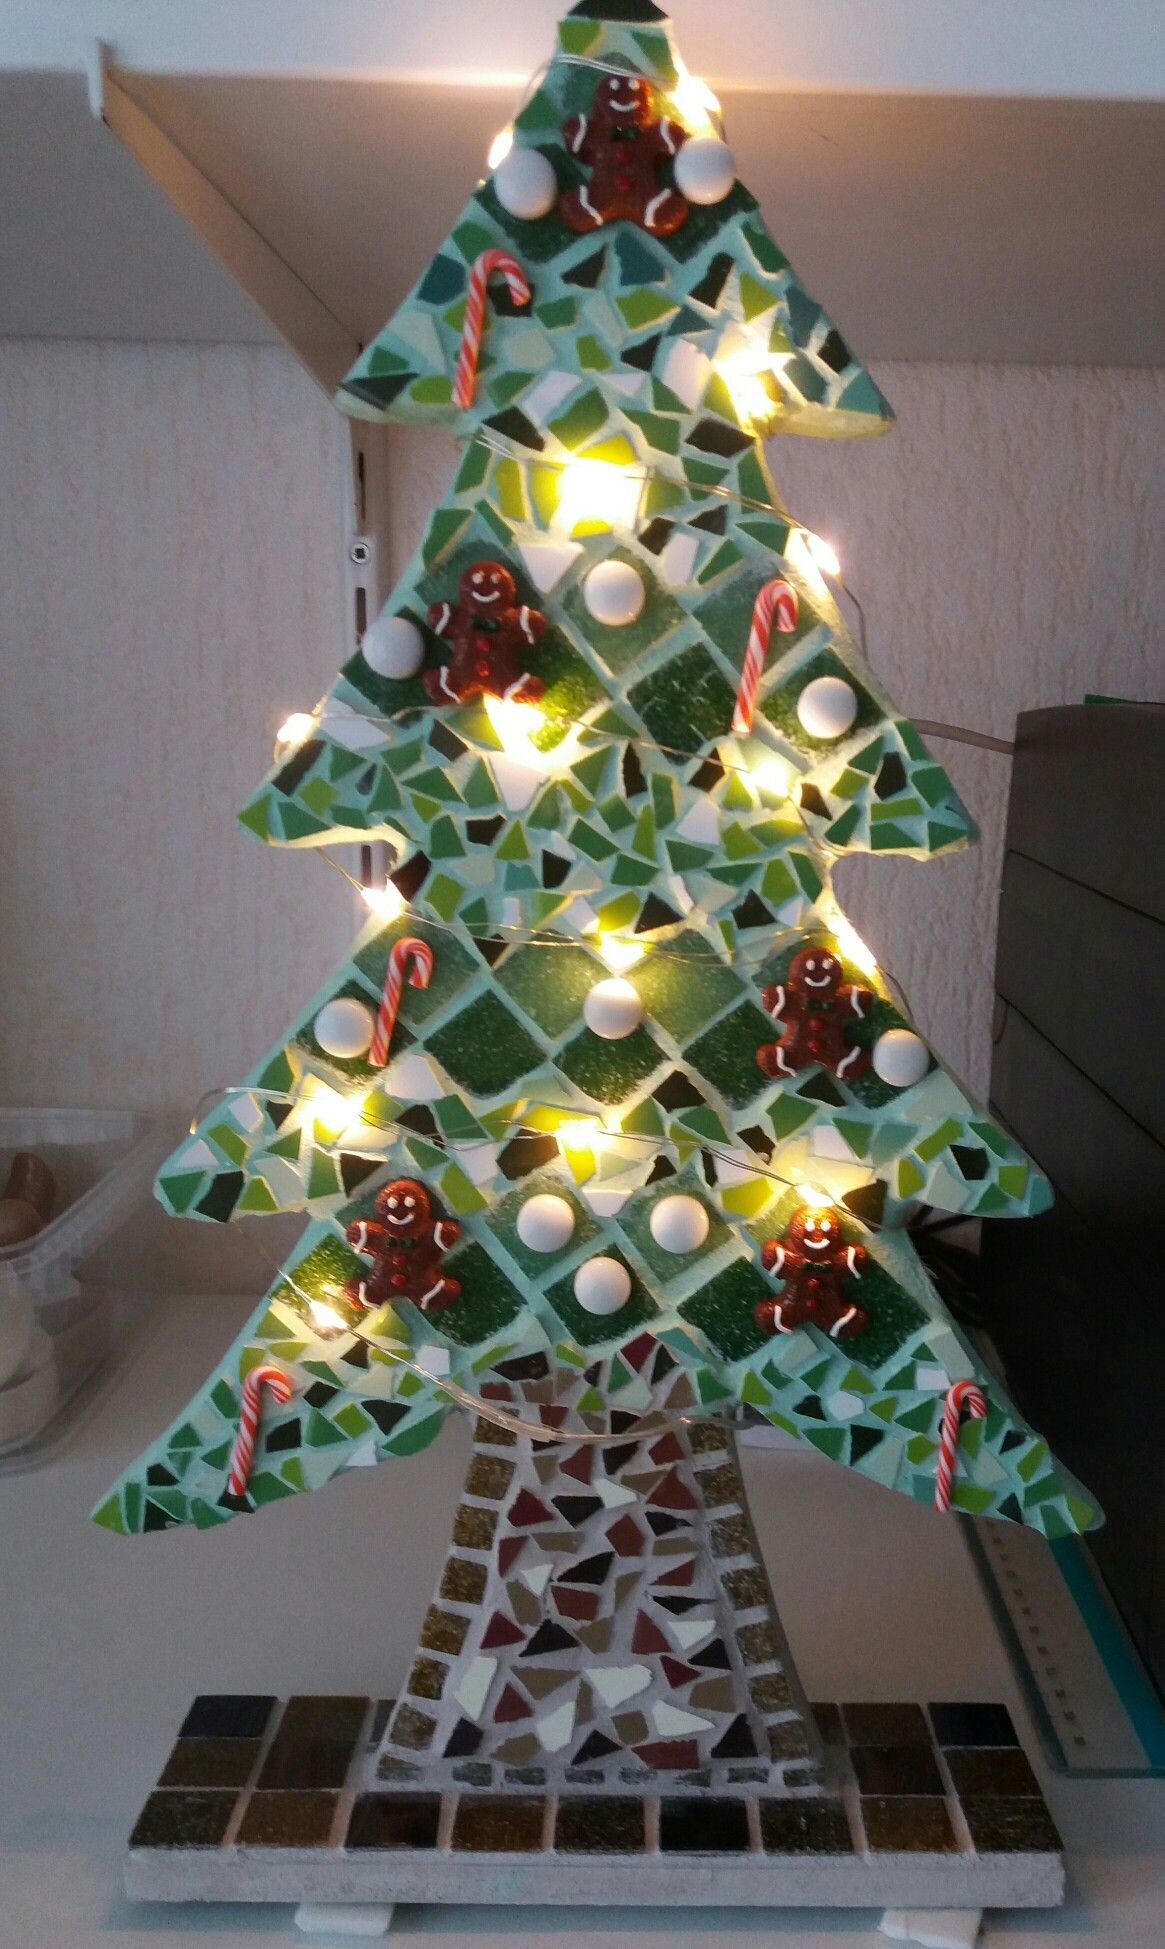 Pin By Teresa Siegel On Mosaics Christmas Mosaics Diy Christmas Cards Mosaic Crafts